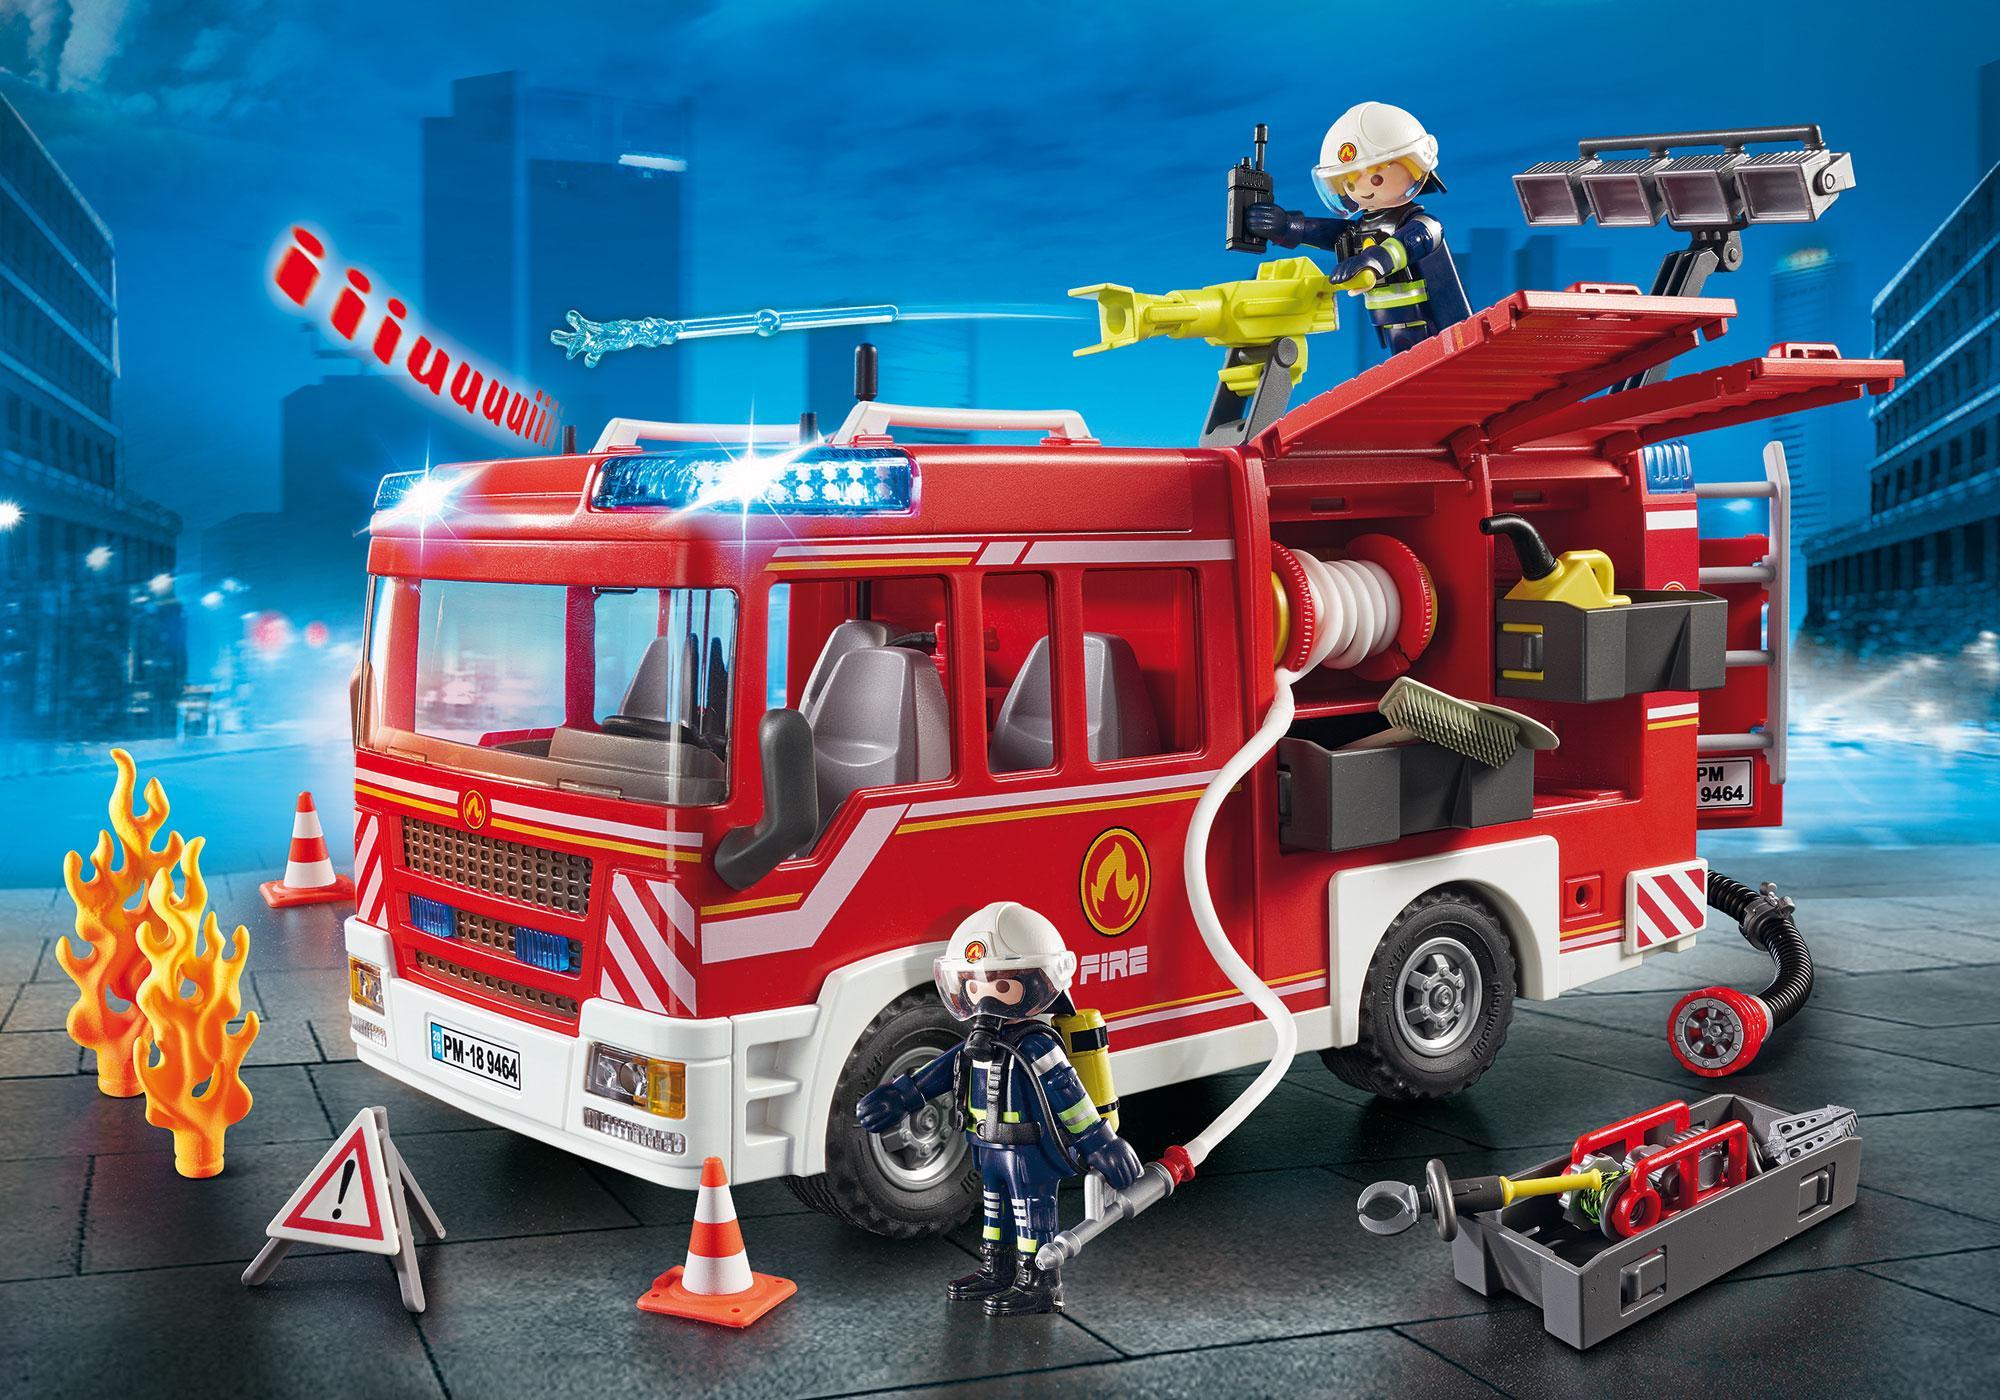 http://media.playmobil.com/i/playmobil/9464_product_detail/Πυροσβεστικό όχημα